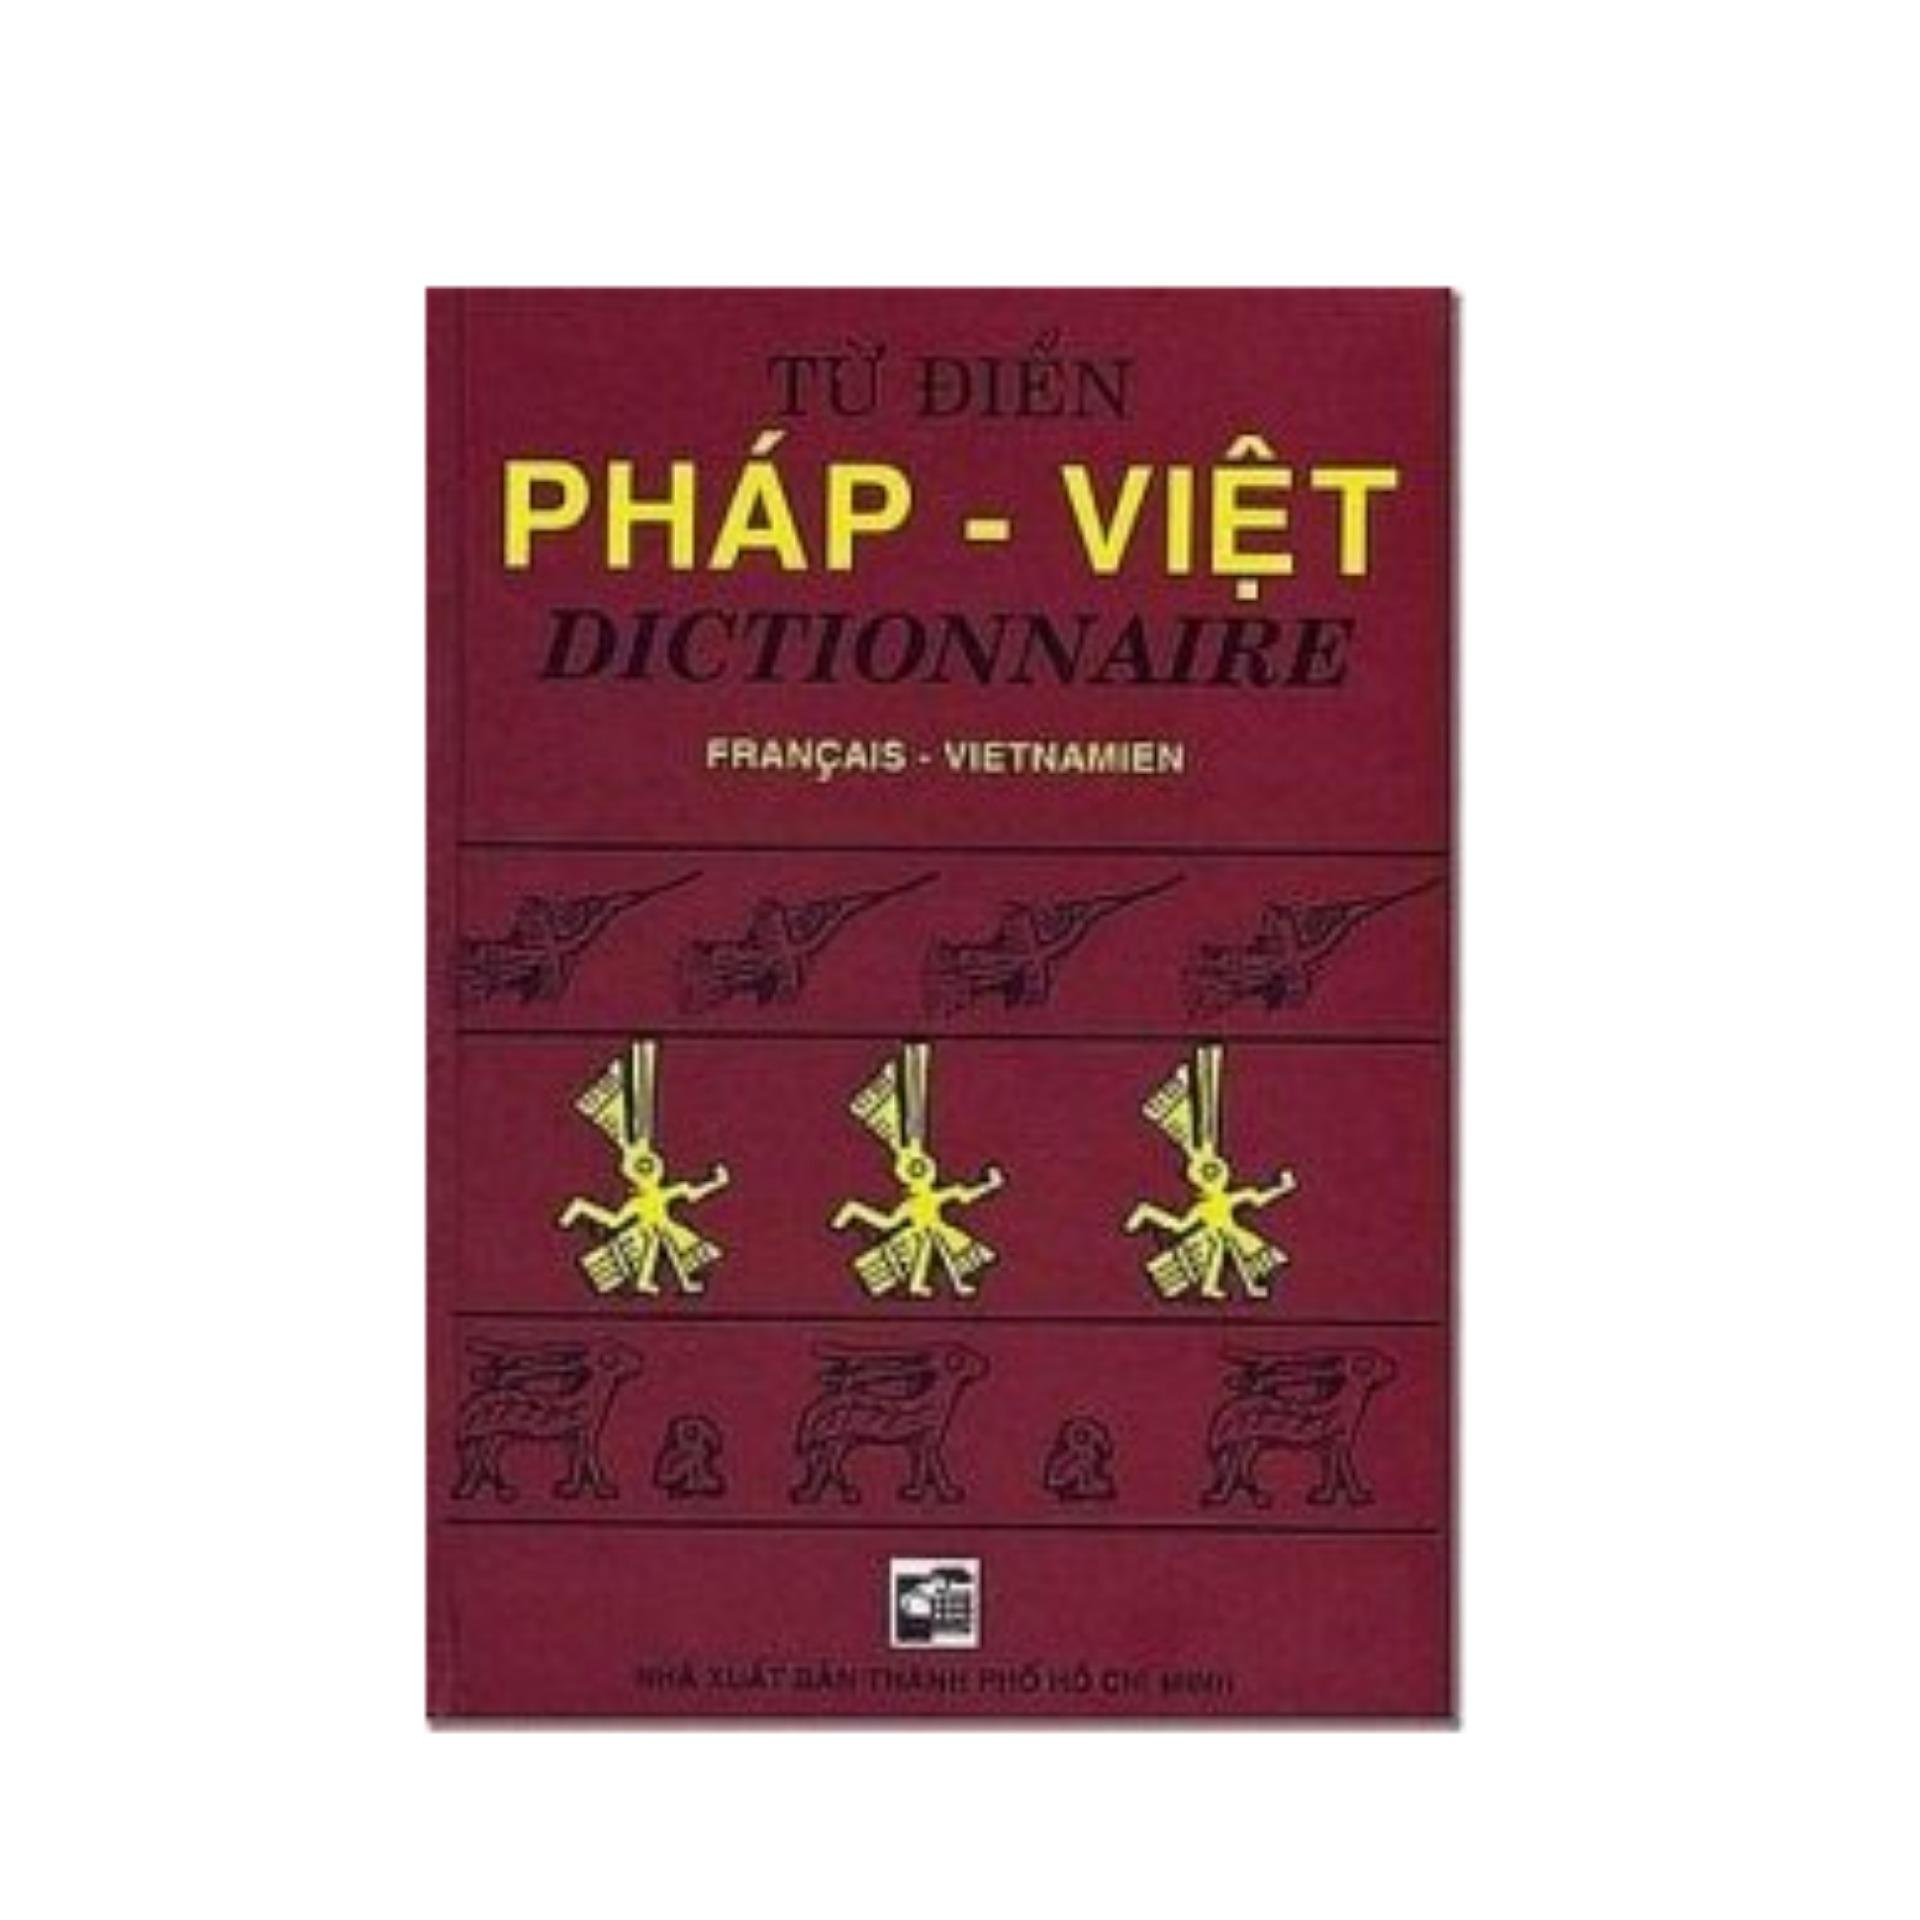 Mua Từ Điển Pháp – Việt Dictionnaire